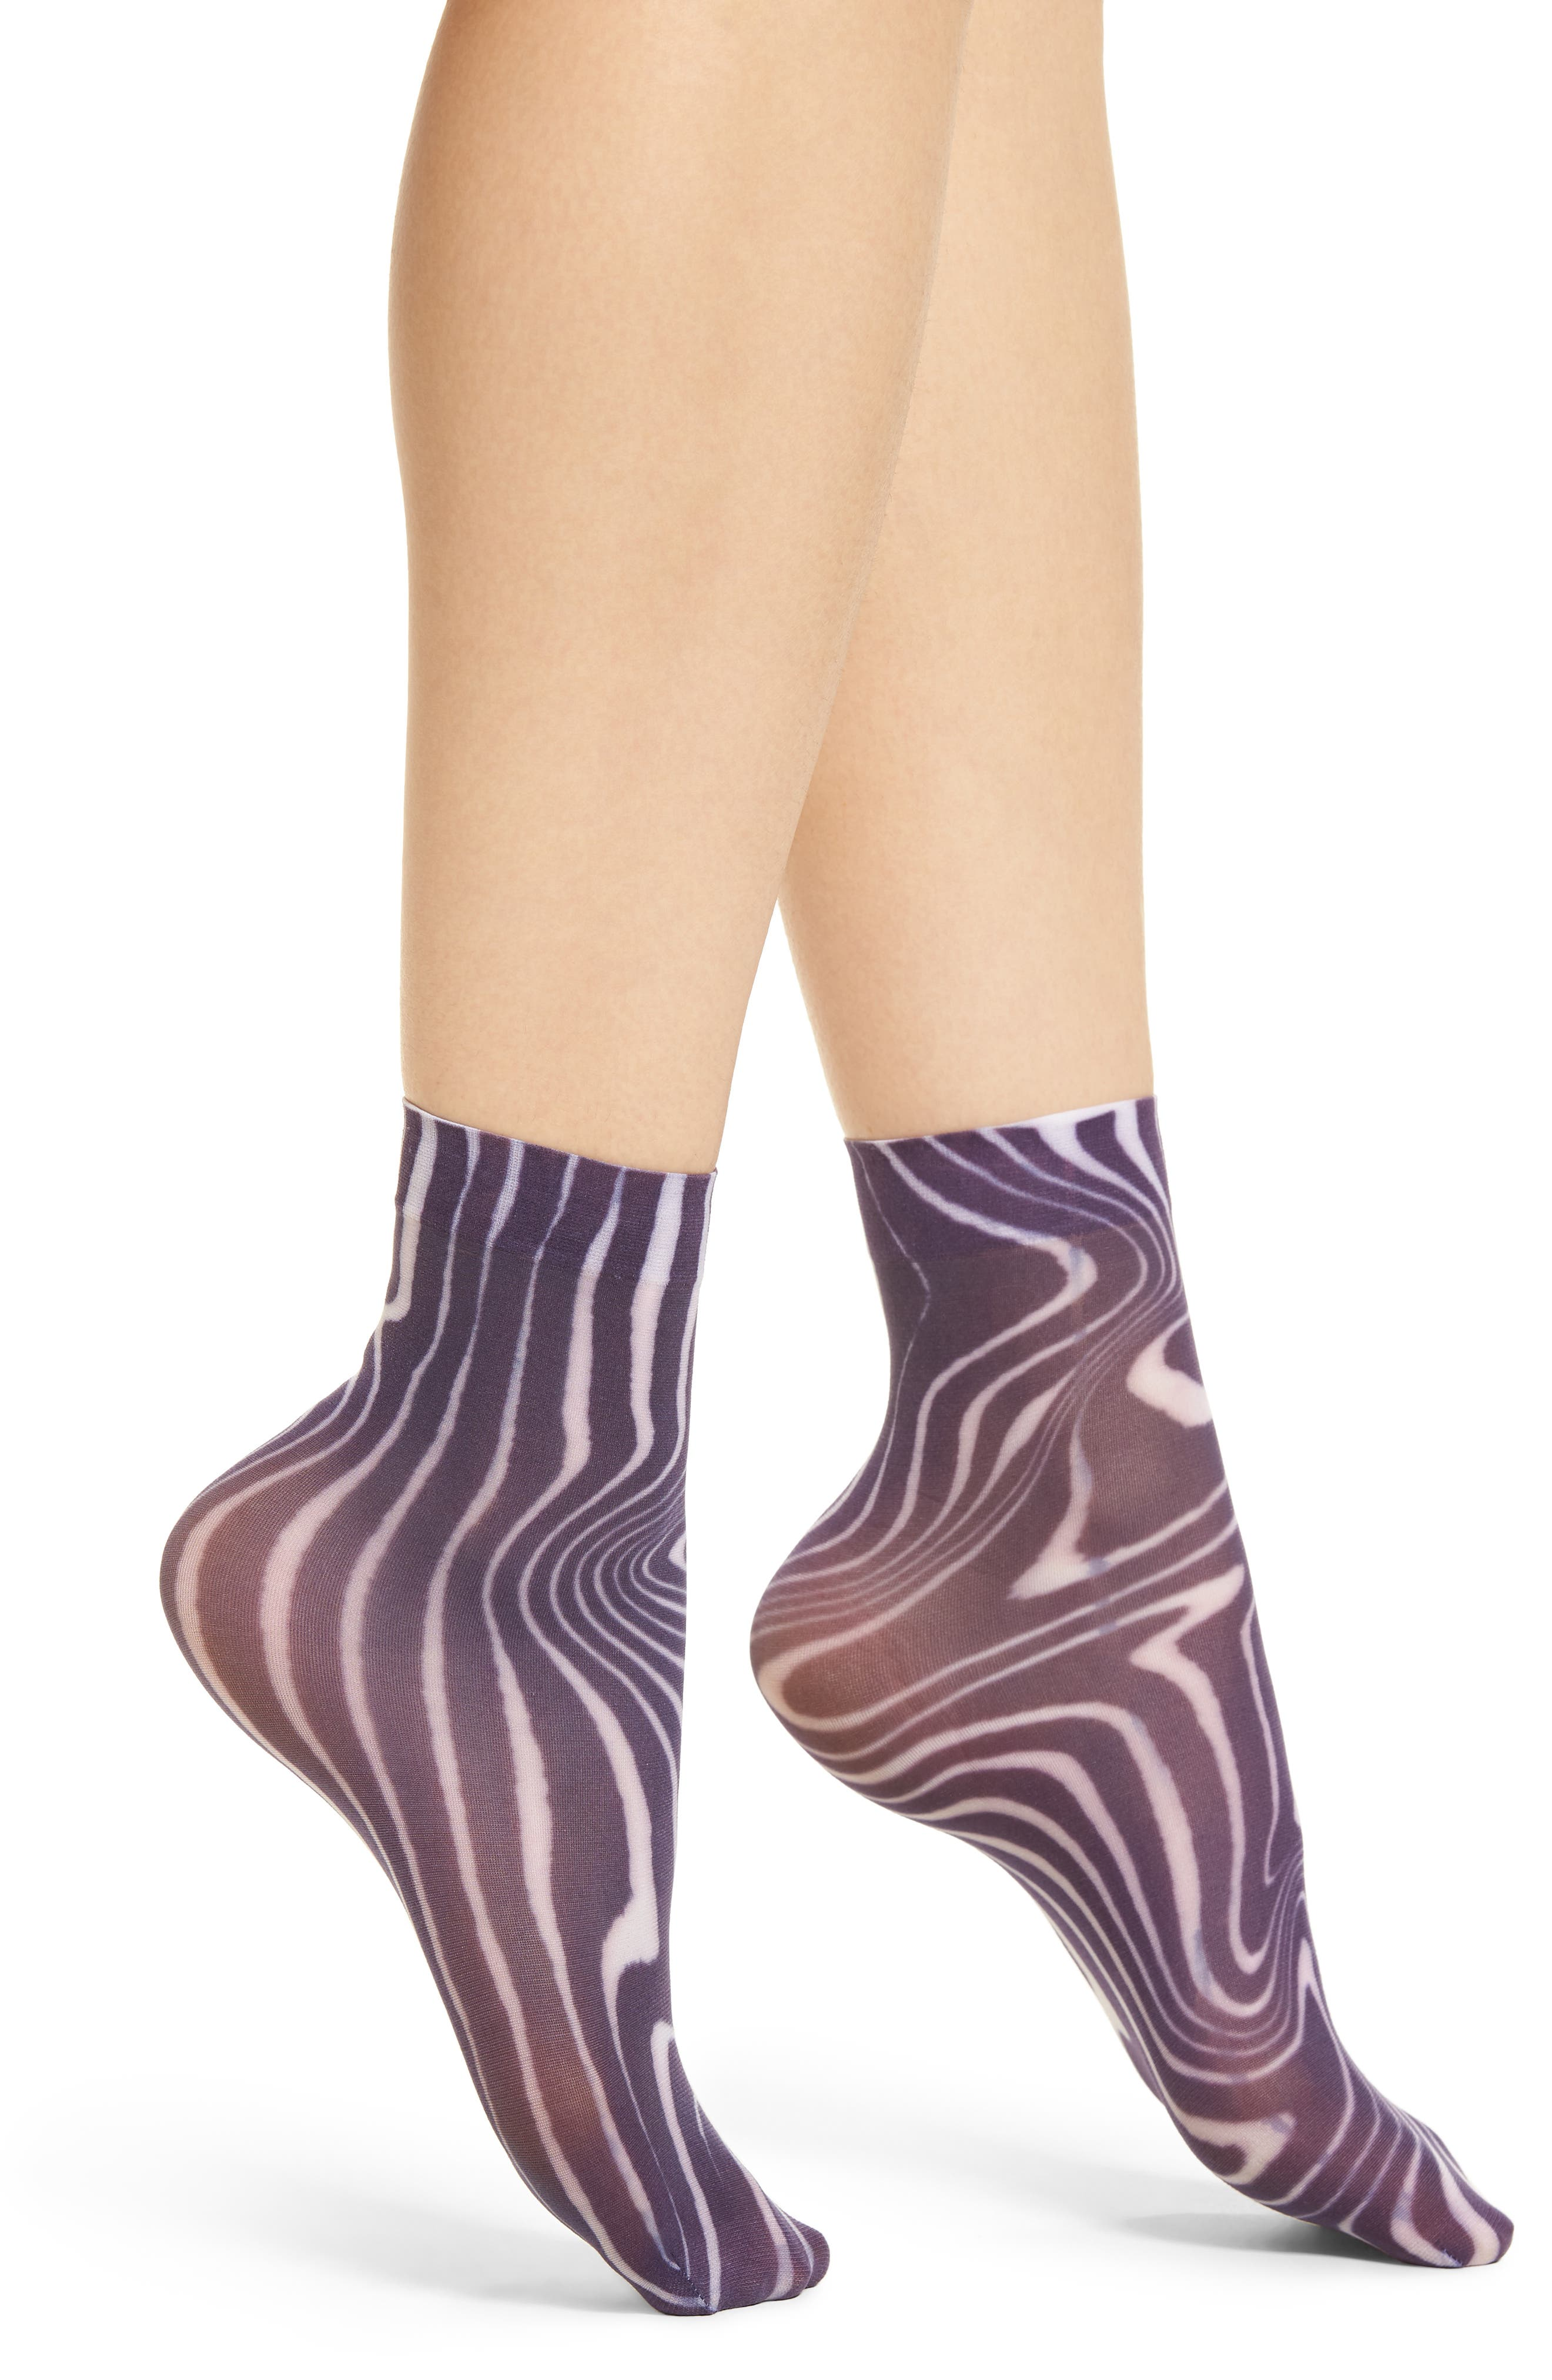 Mia Ankle Socks,                         Main,                         color, BLACK